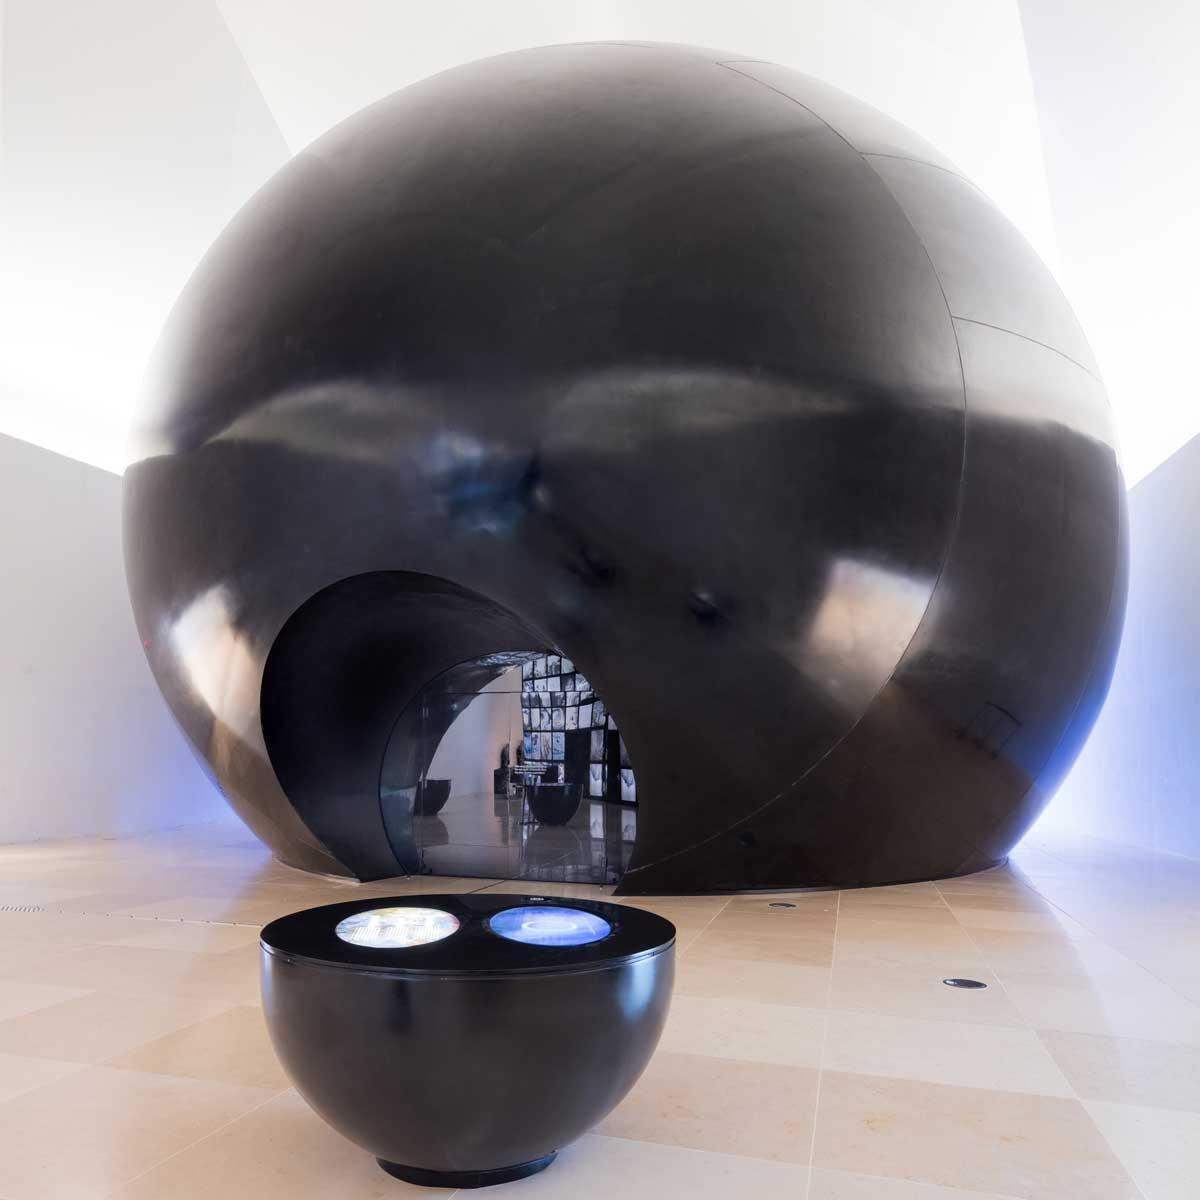 Museu do Amanhã, Rio de Janeiro, Brasil: the Cosmos instalacija kreirana sa DuPont™ Corian® u Nocturne koloru; foto: Andres Otero, sva prava zadržana